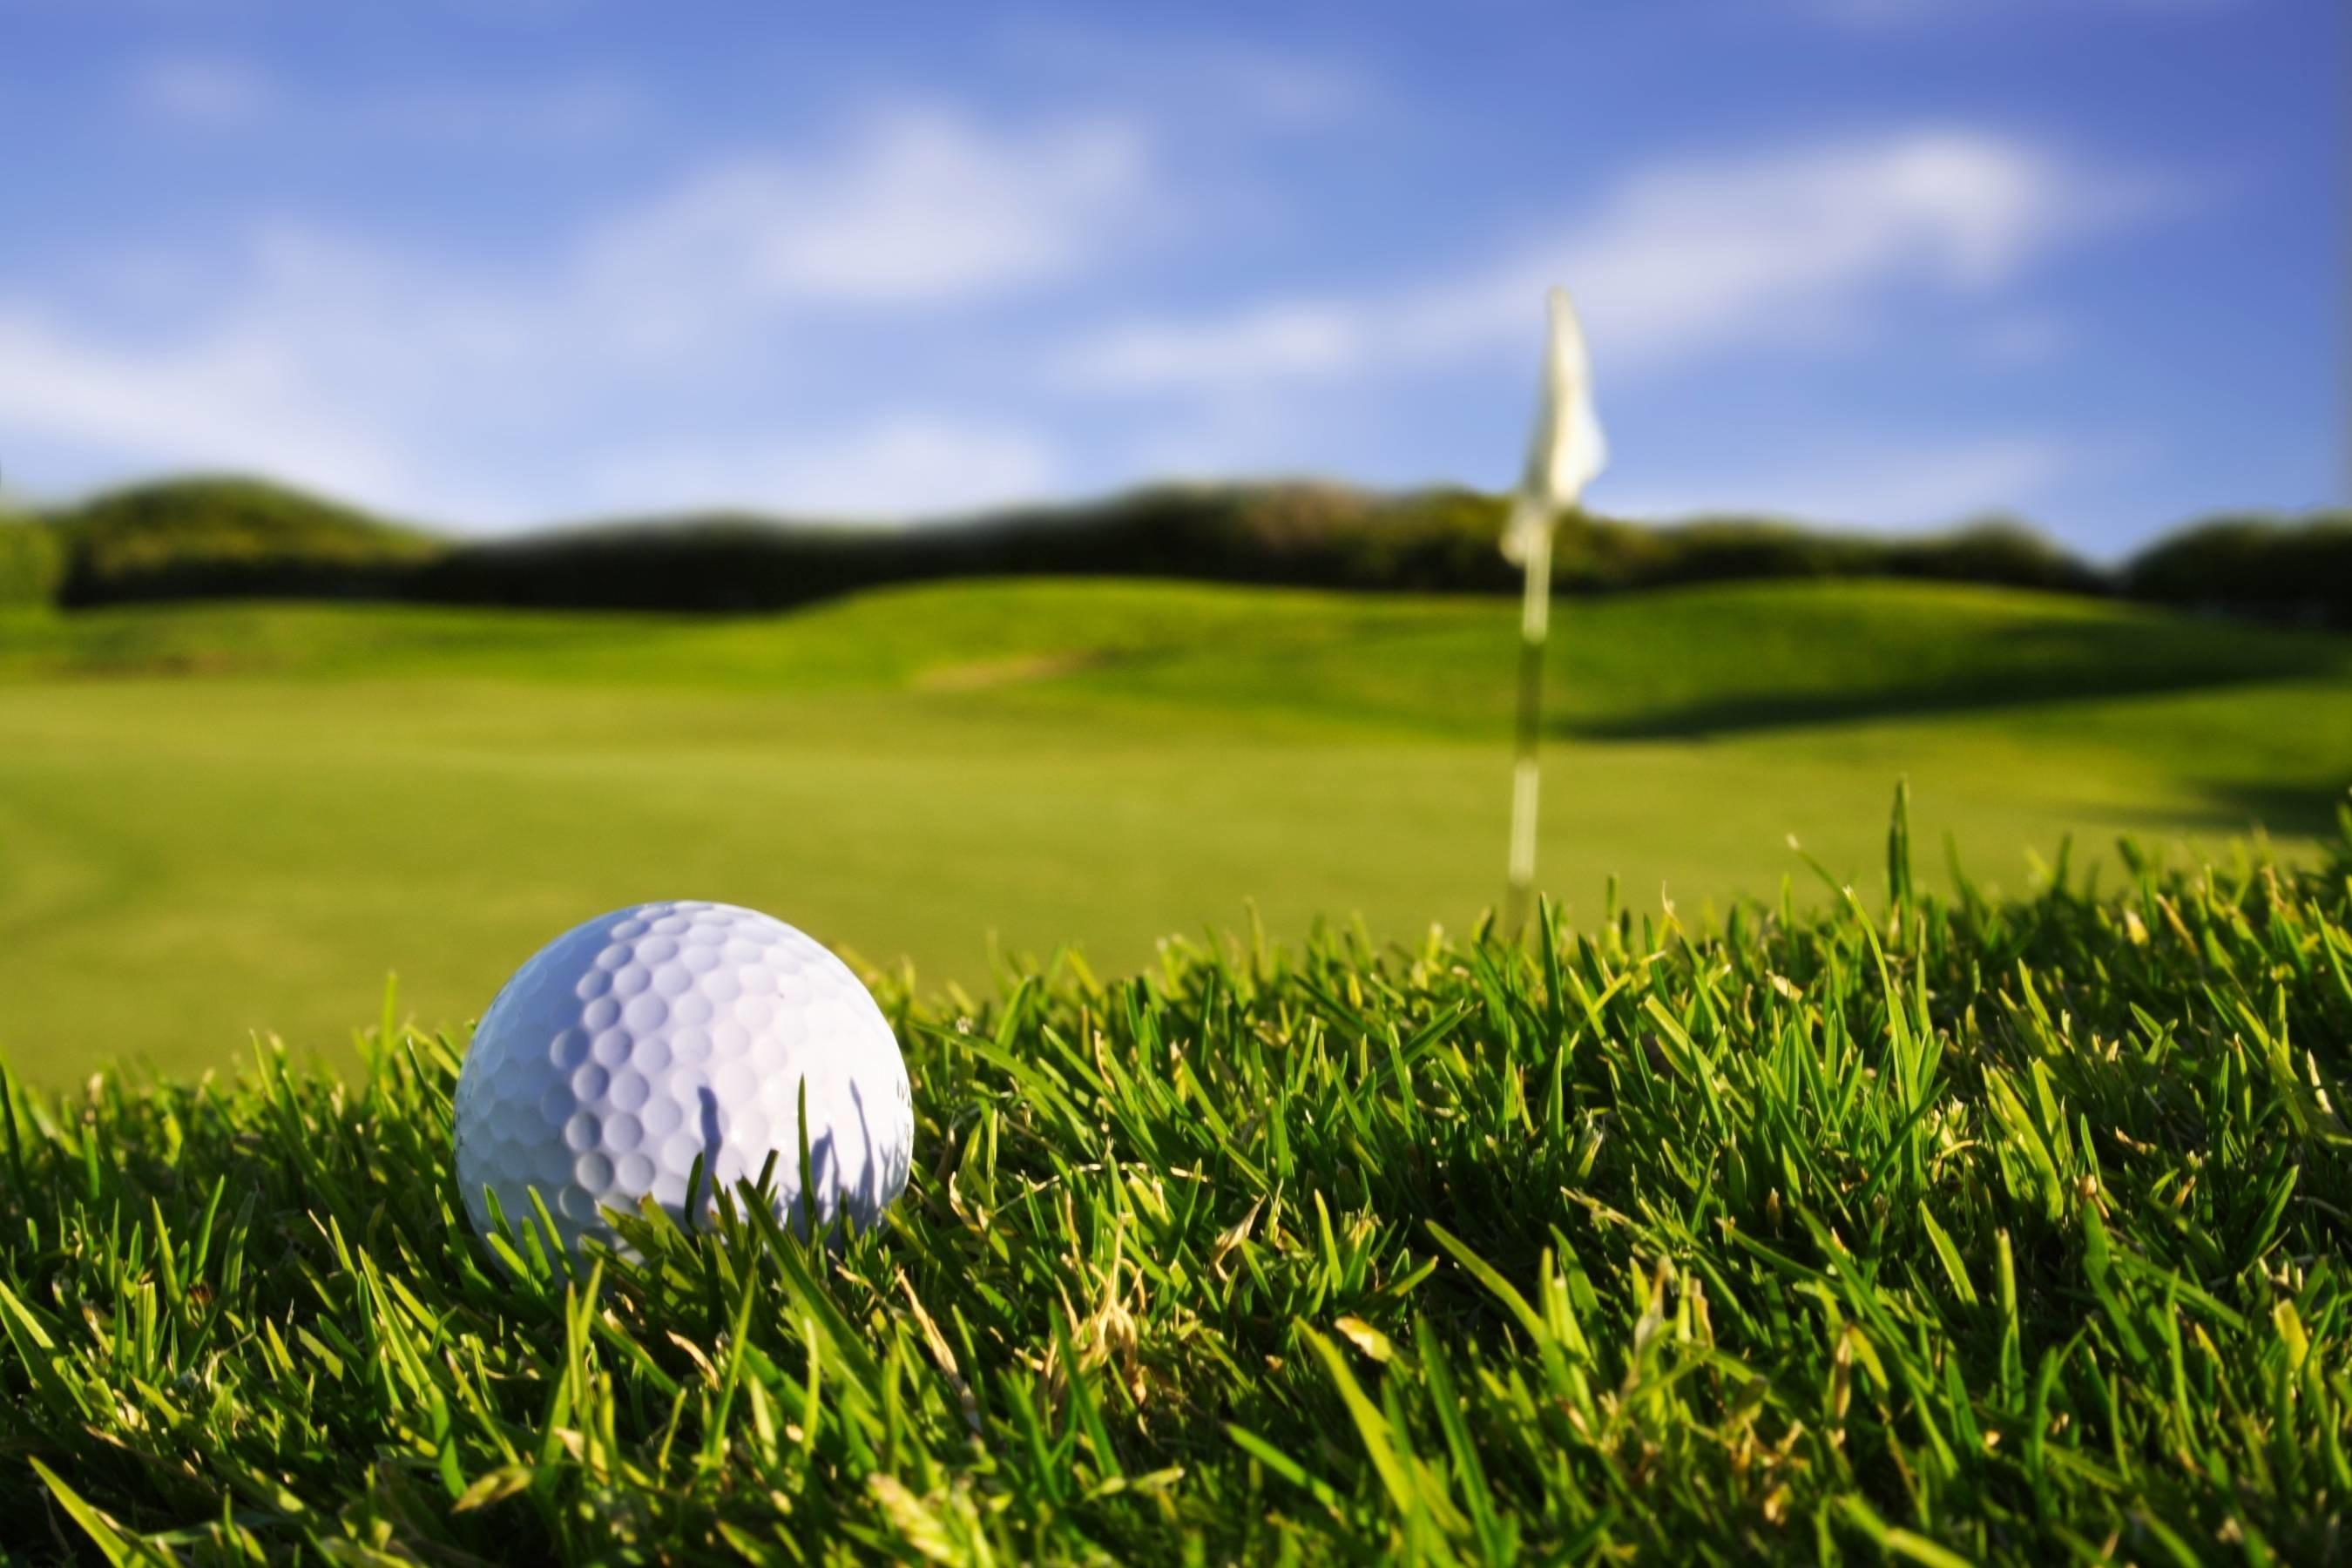 Wallpapers For > Desktop Backgrounds Hd Golf